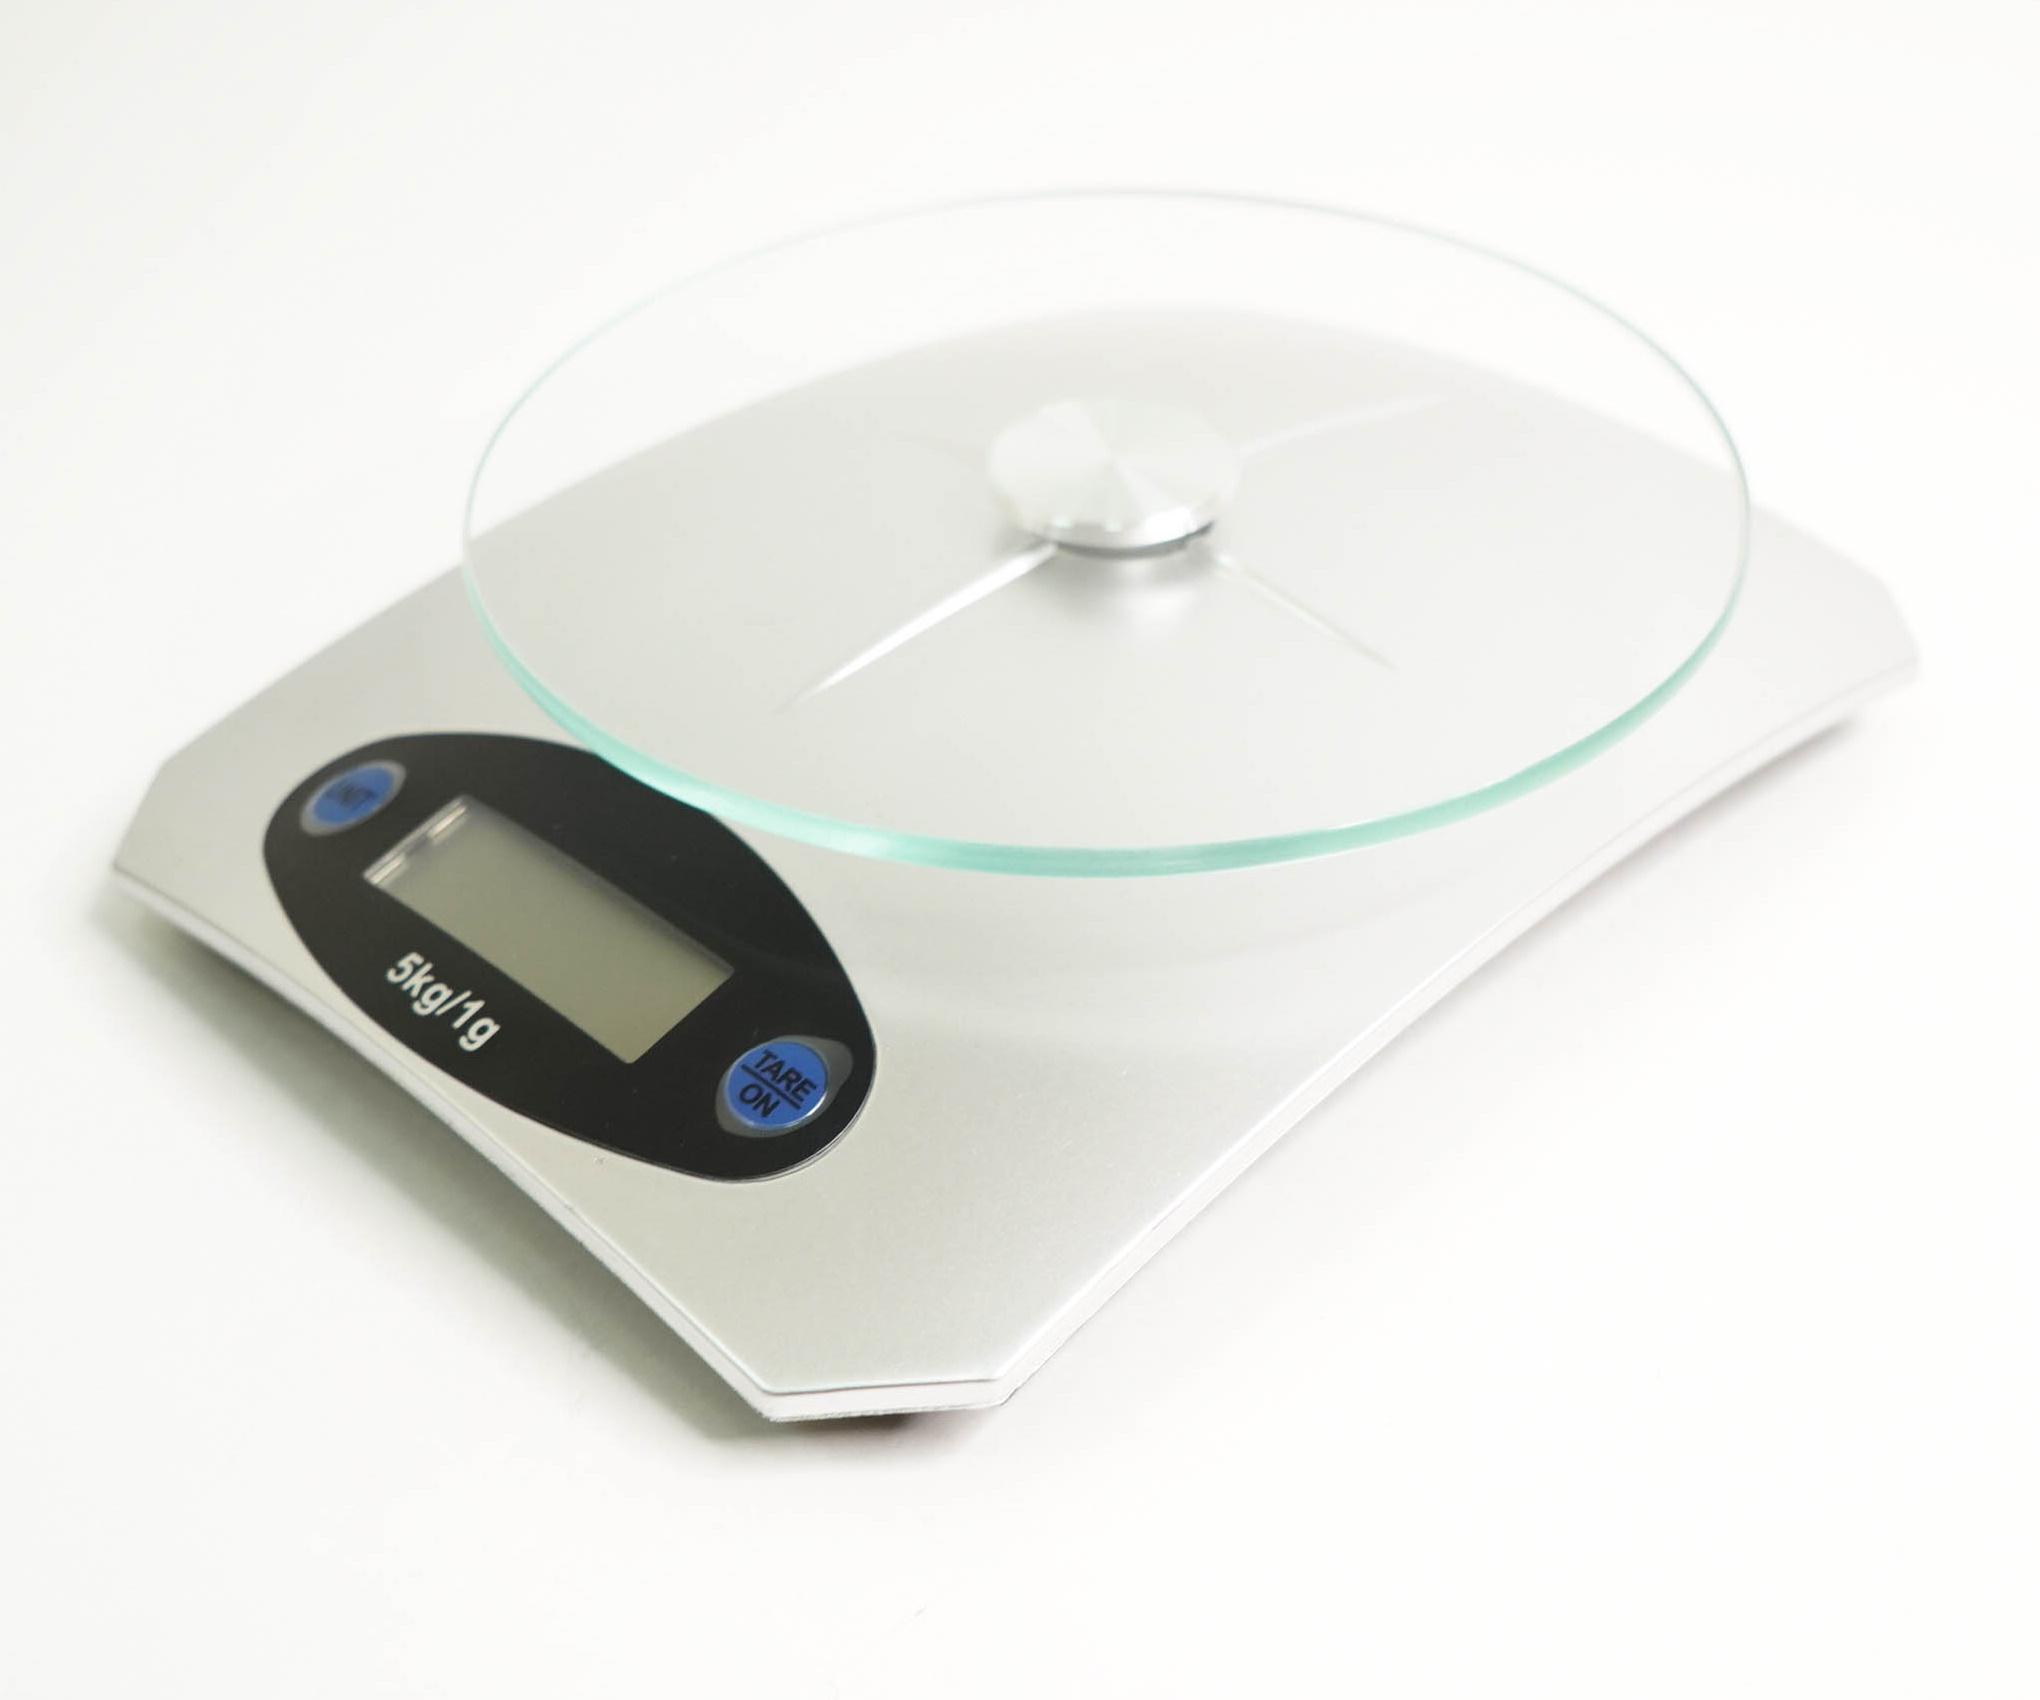 Весы электронные универсальные до 5 кг ± 1 г (BH-WP505)